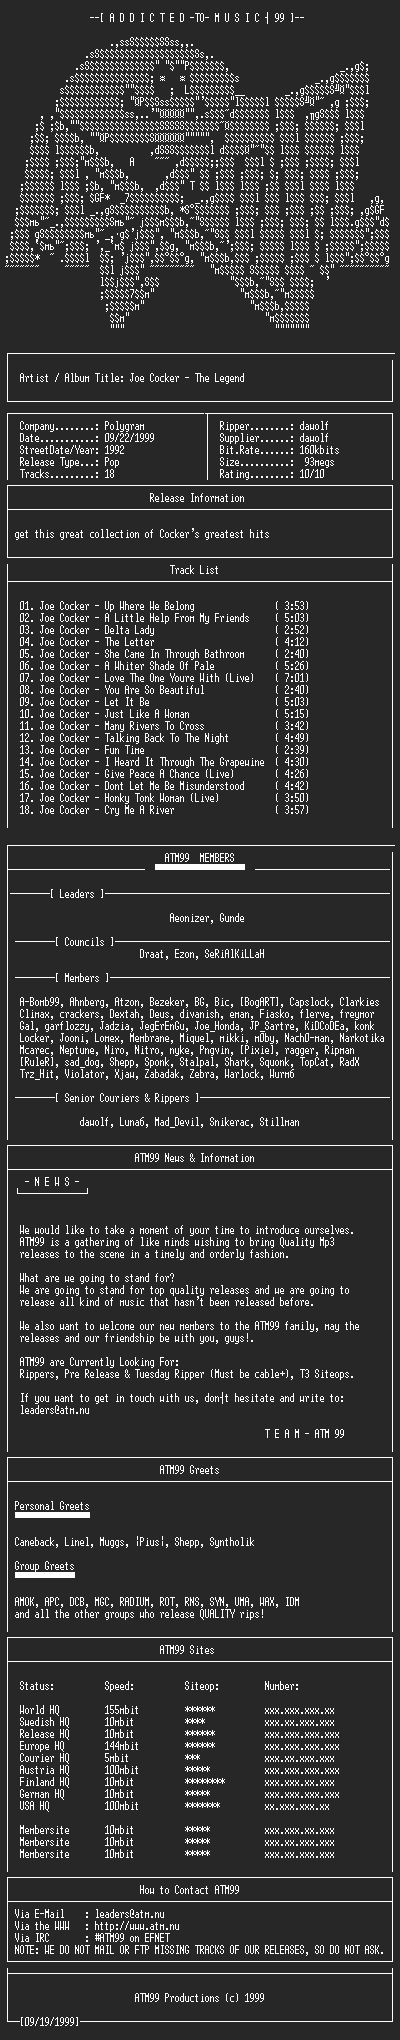 NFO file for Joe_Cocker_-_The_Legend_-_(1992)-ATM99